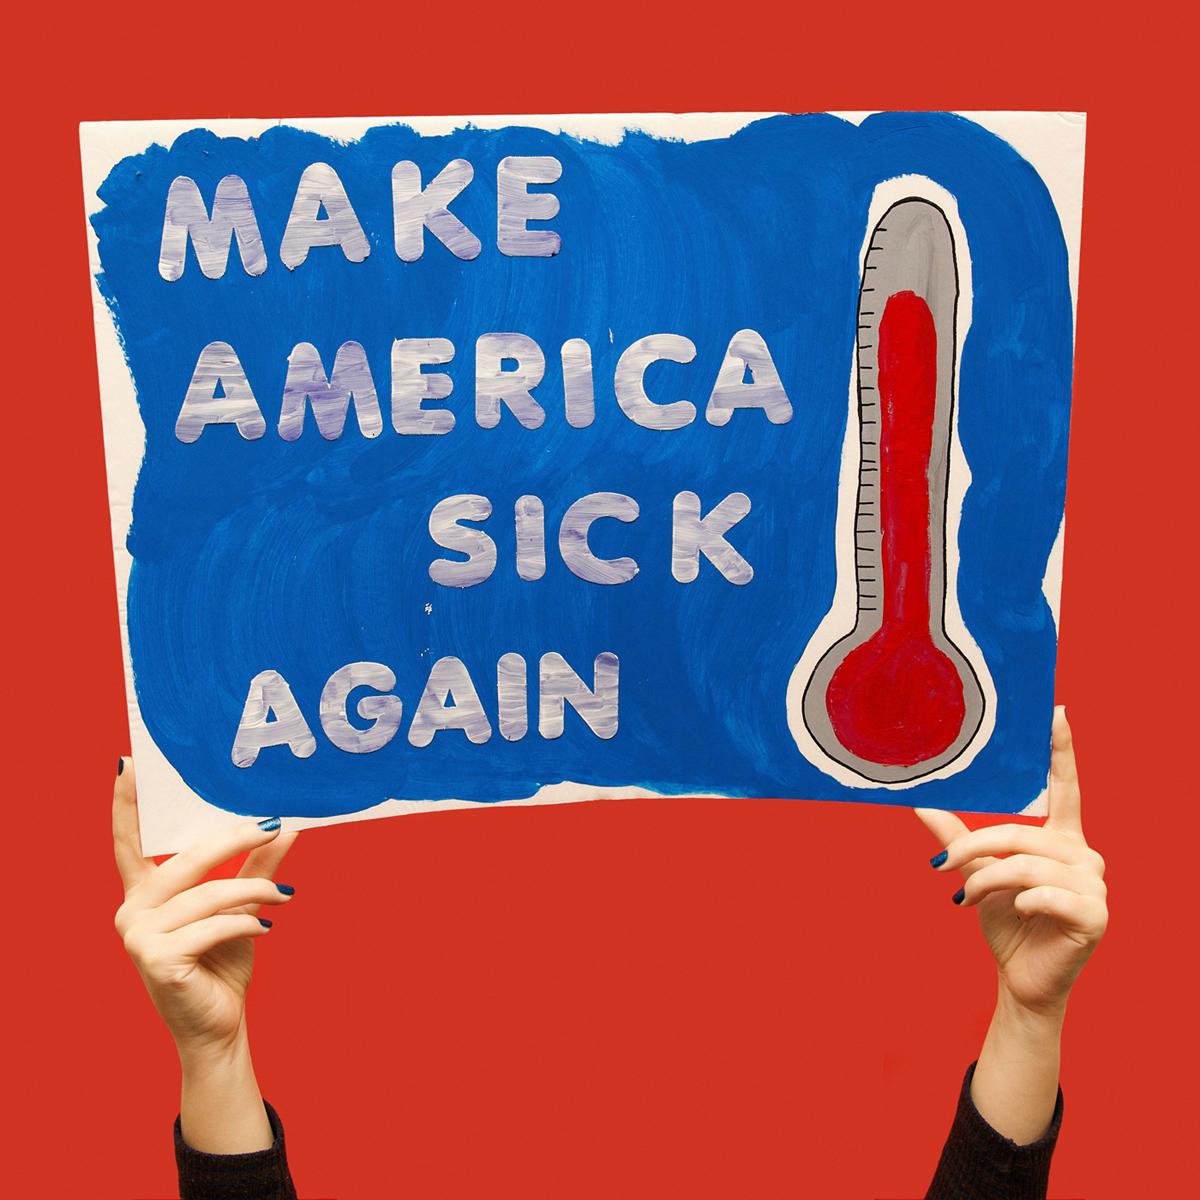 45 Protest Signs_Brandon and Olivia Locher_23_Make America Sick Again